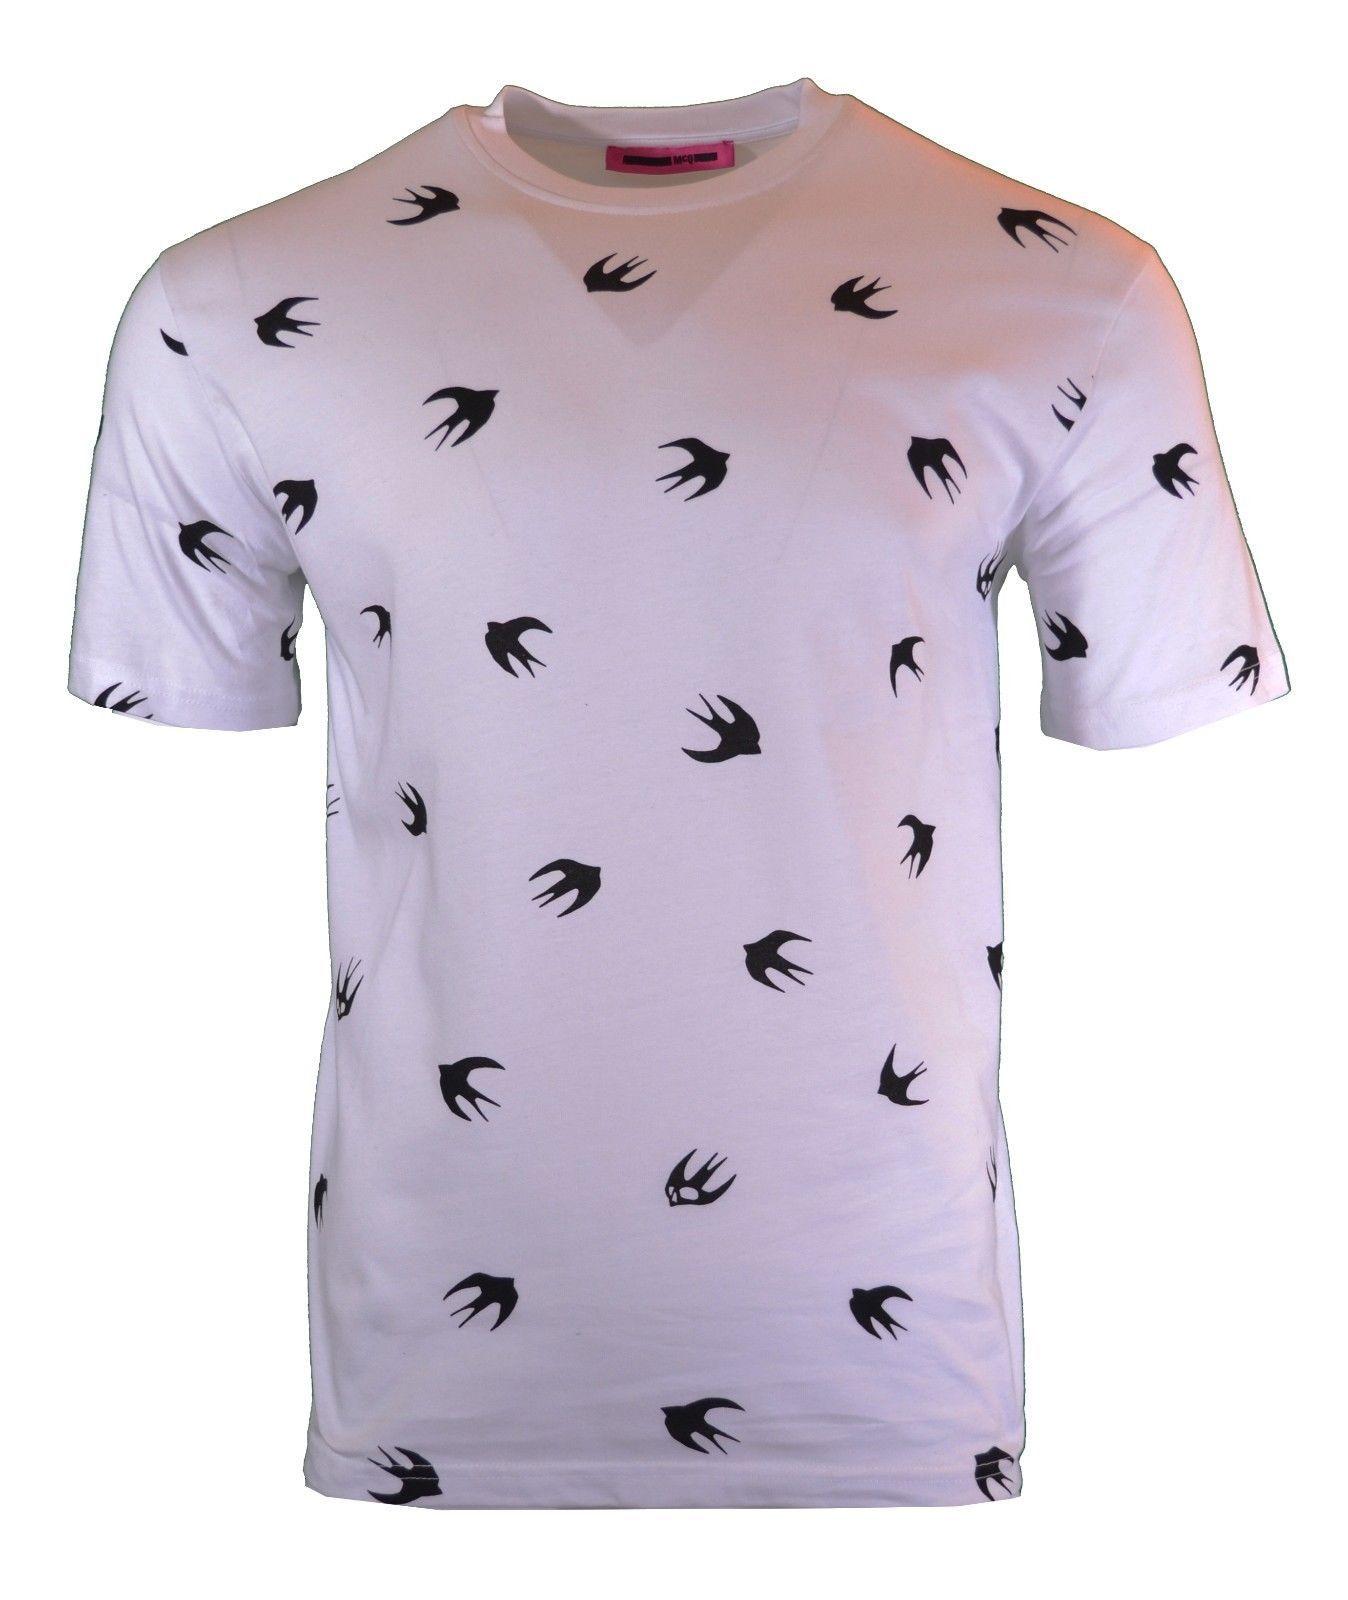 MCQ VELOUR SWALLOW SWEATSHIRT JUMPER  BLACK ALEXANDER MCQUEEN BIRD PRINT RARE